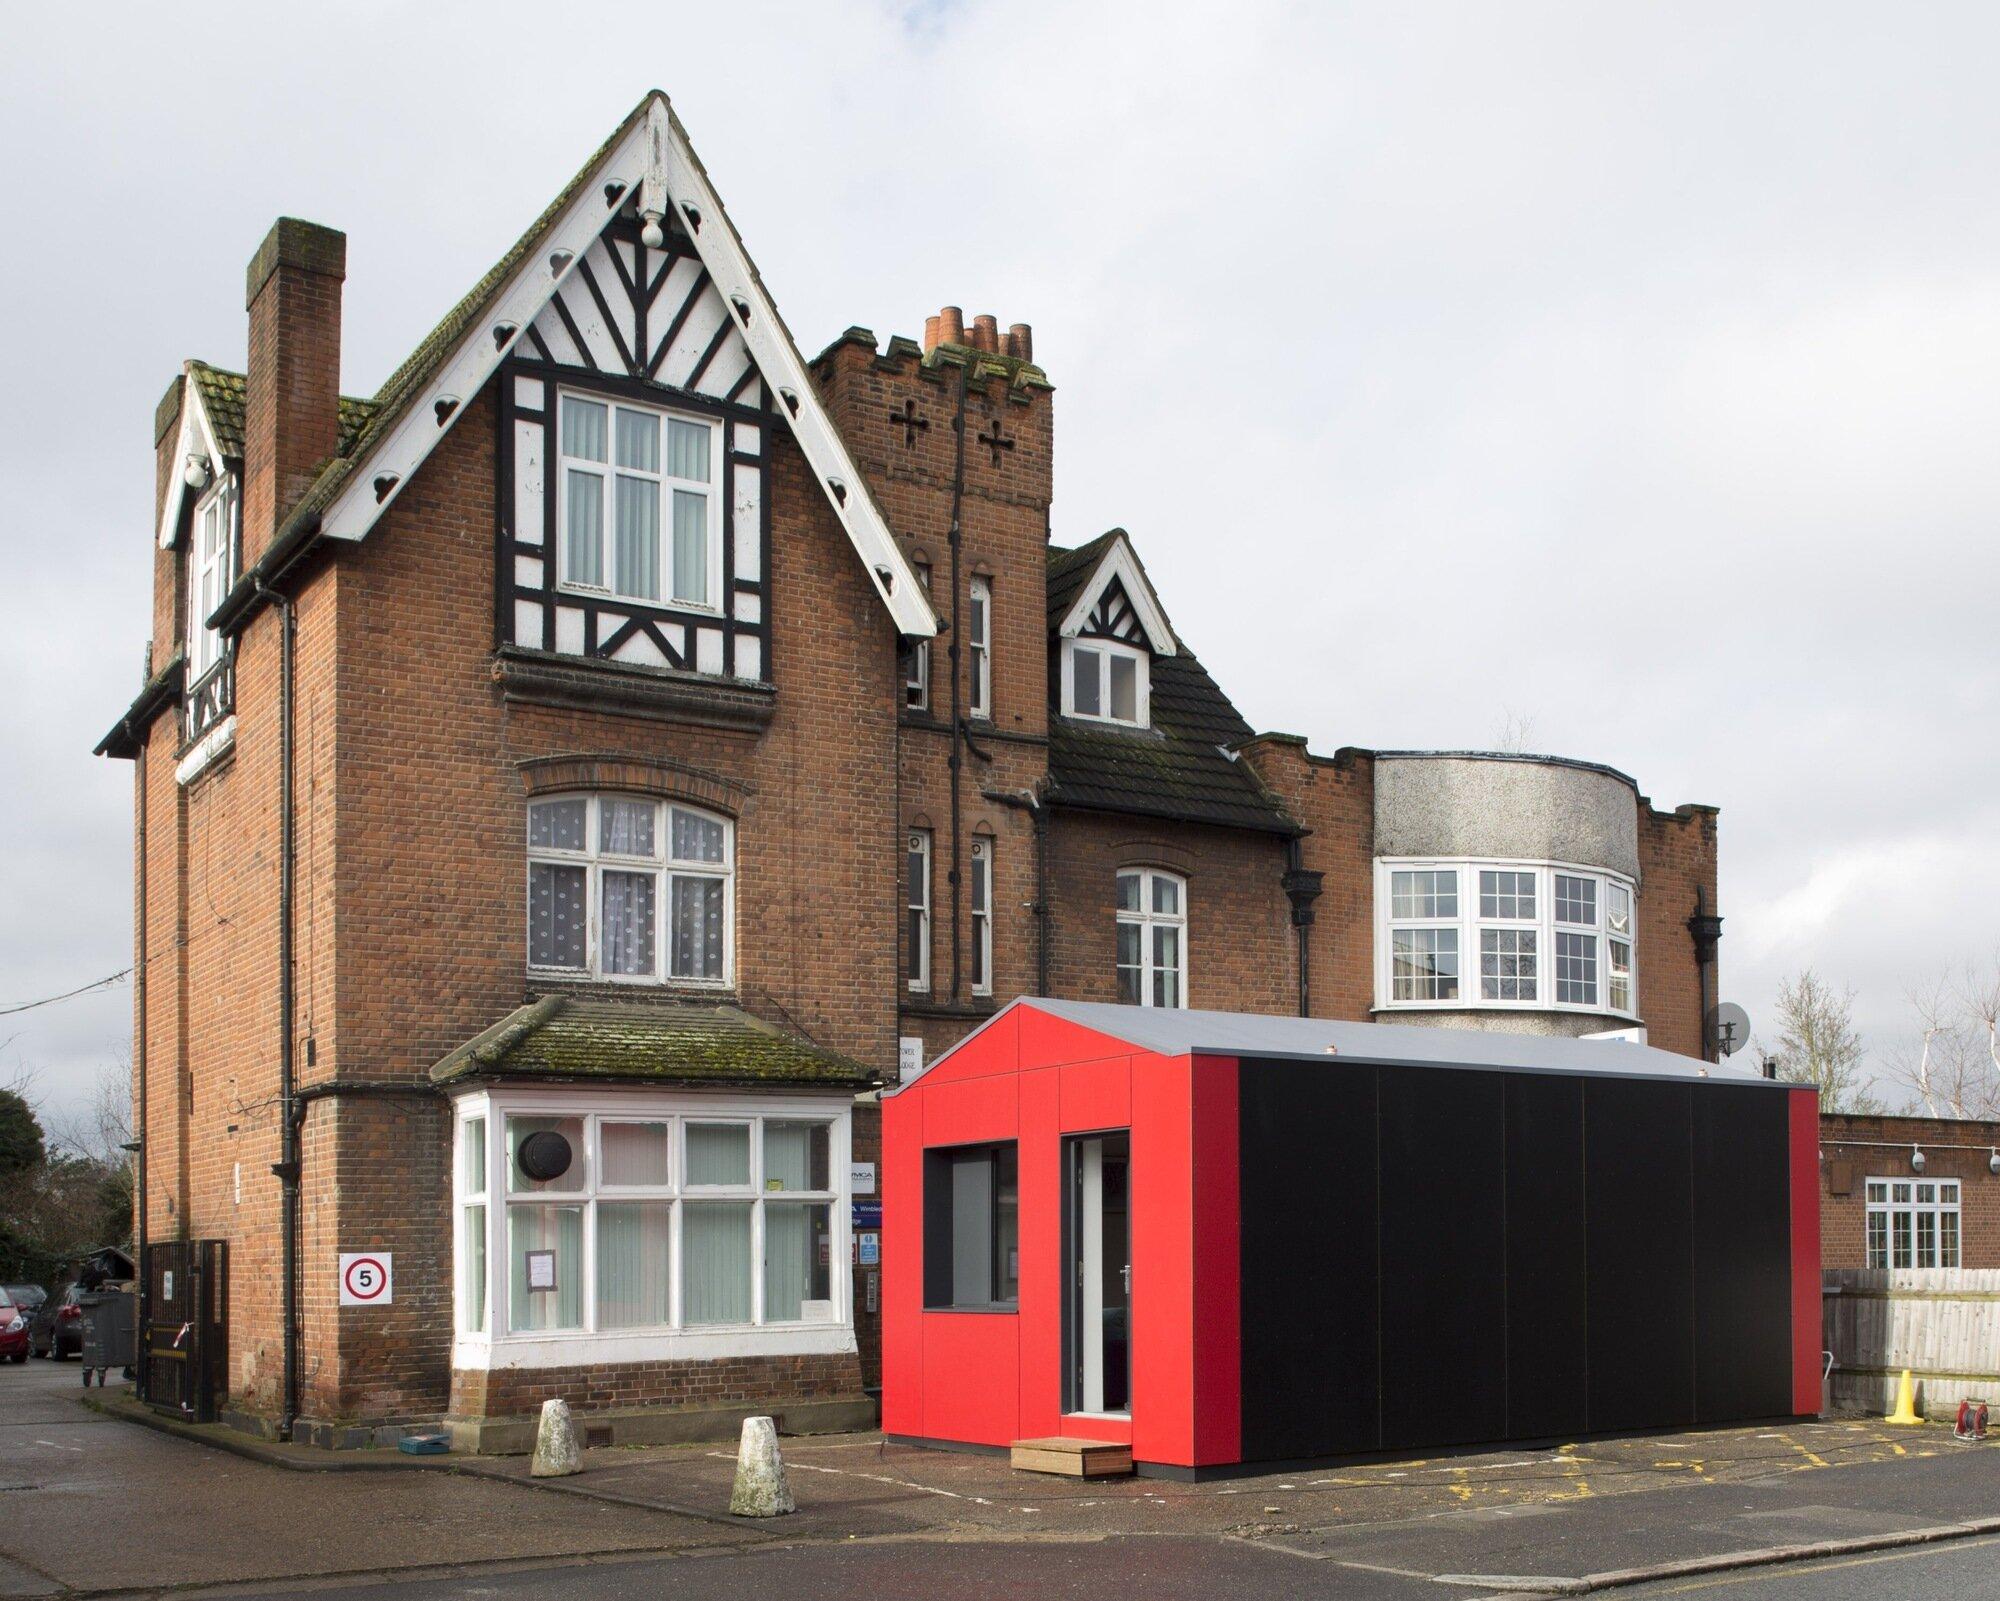 Richard Rogers - Pre-Fab Y-Cube - UK - Tiny House - Humble Homes